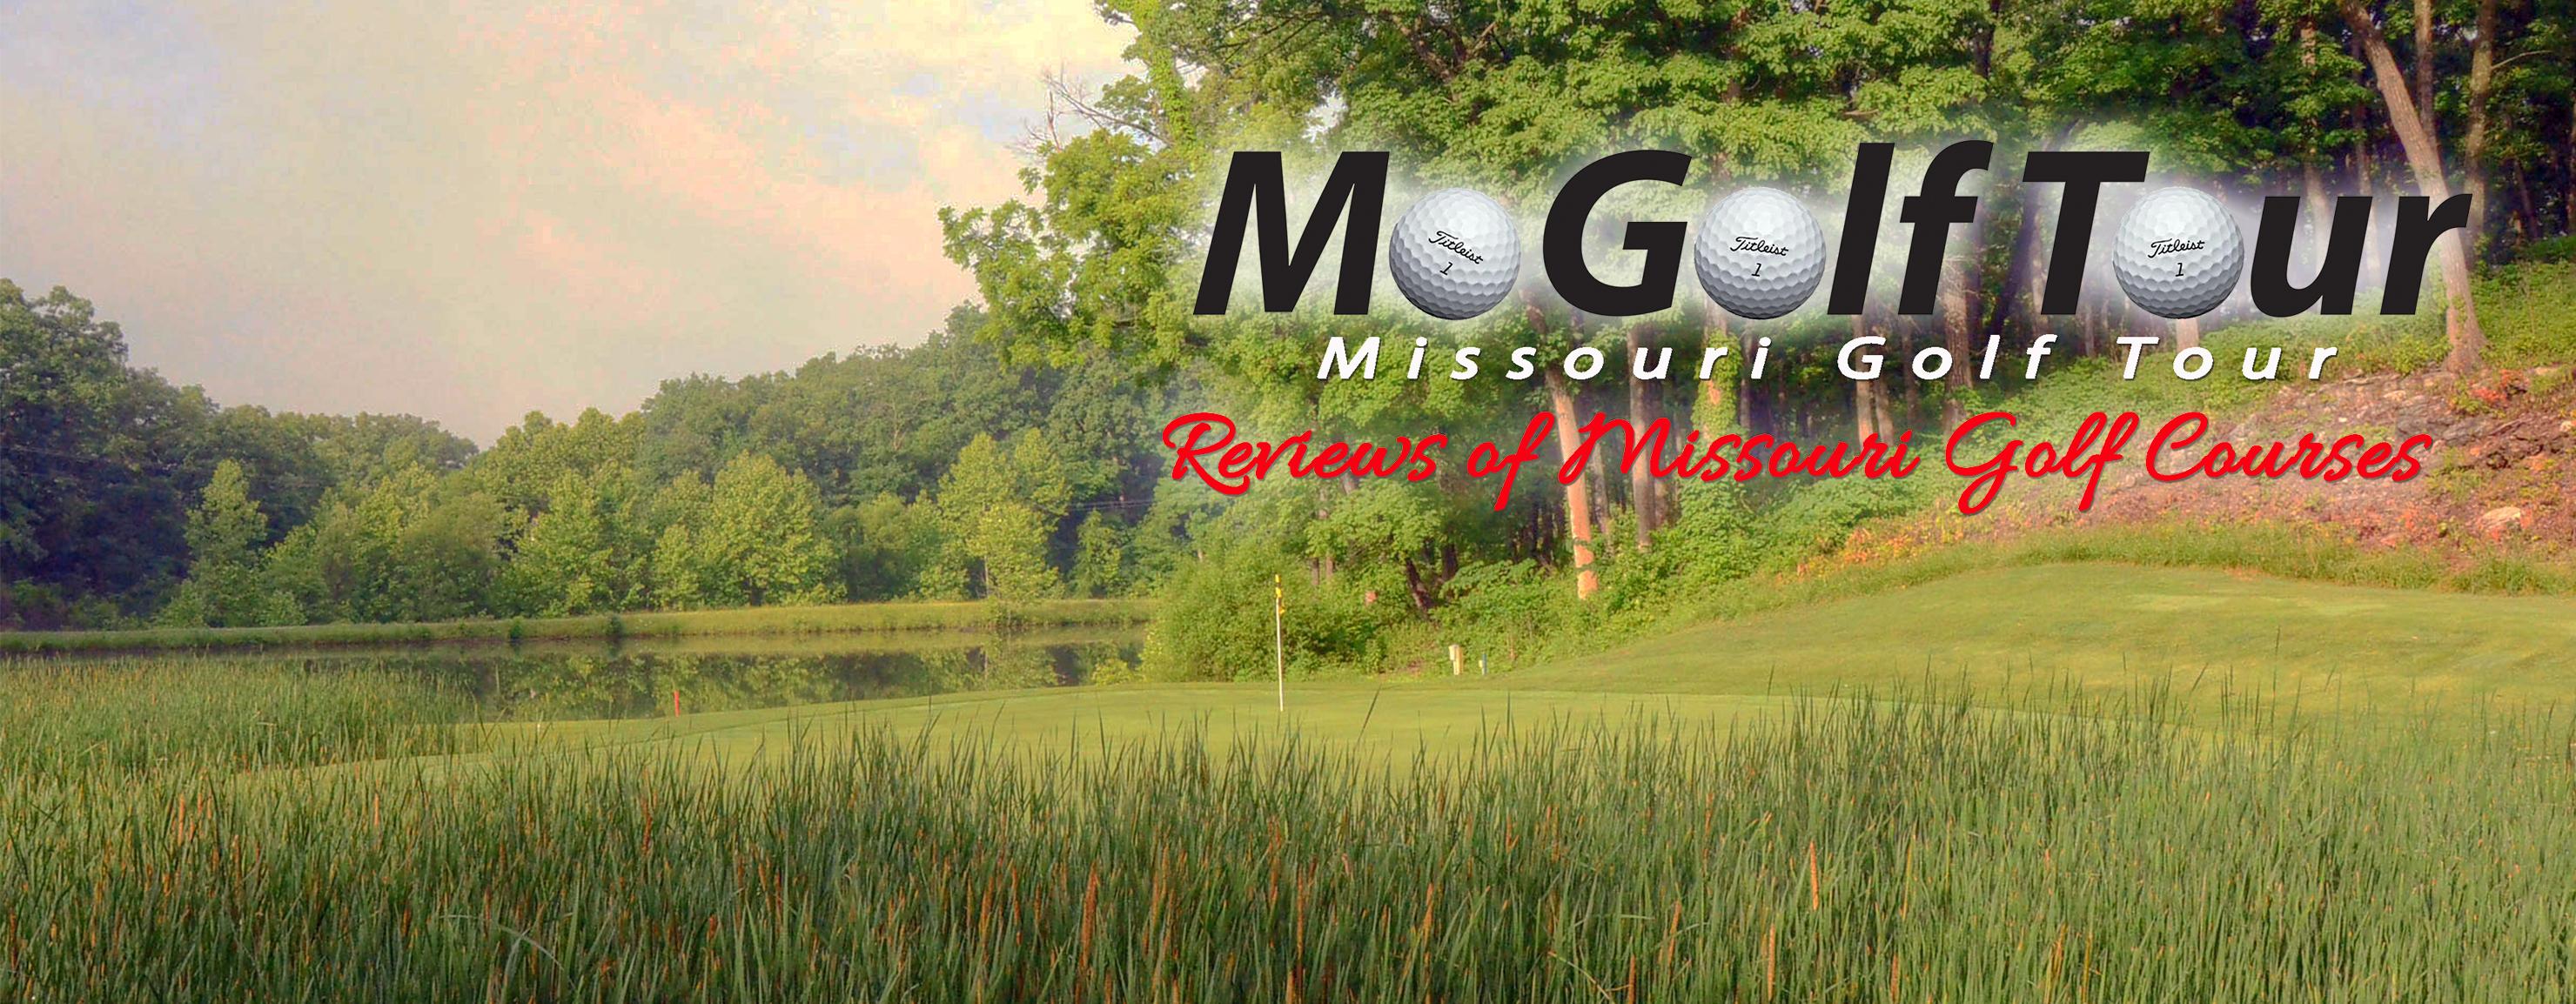 Missouri Golf Courses, Reviews of Missouri Golf Courses